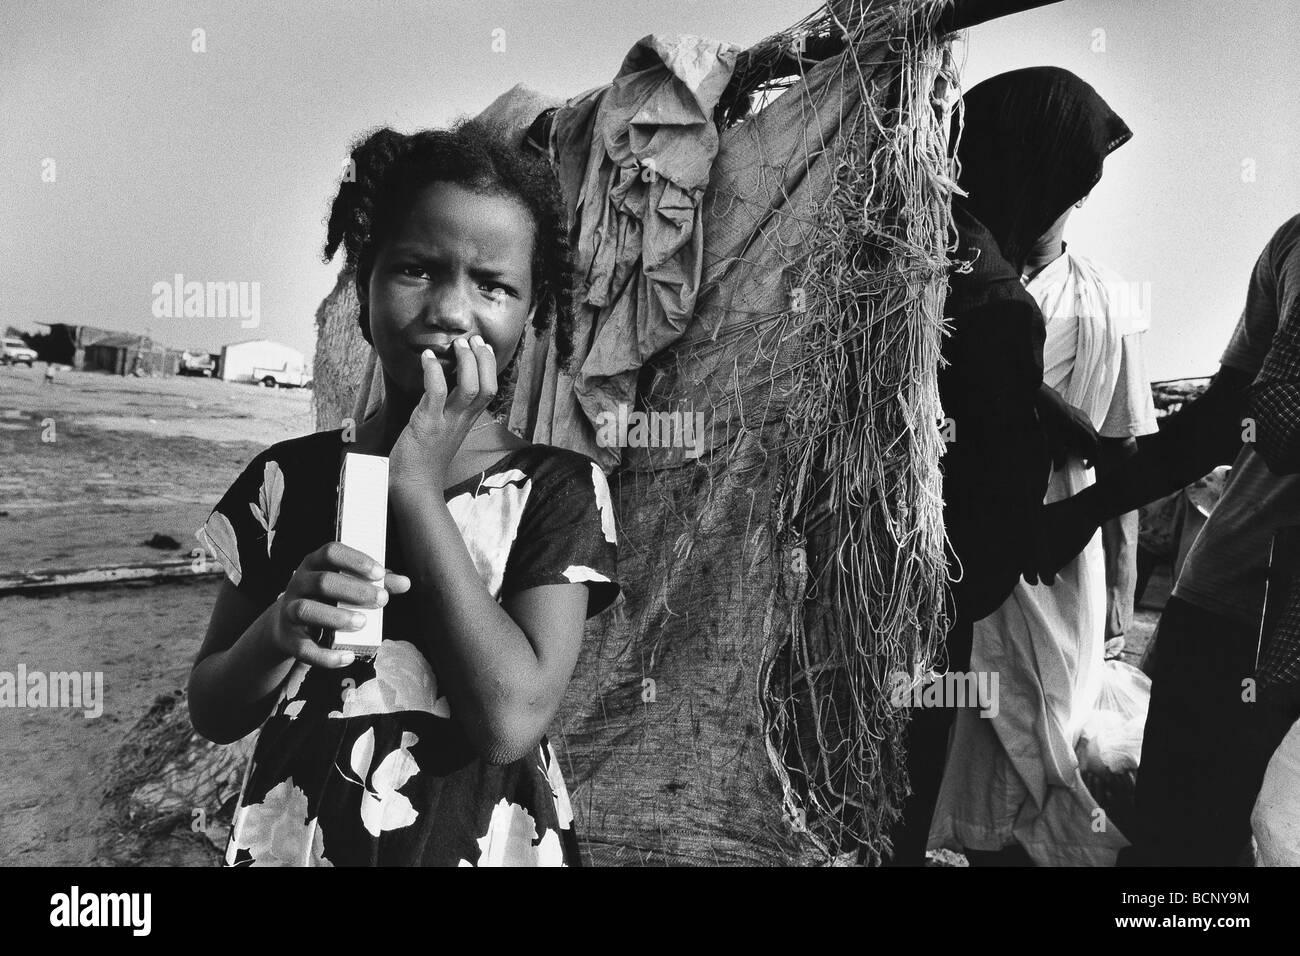 mauritania iouik - Stock Image